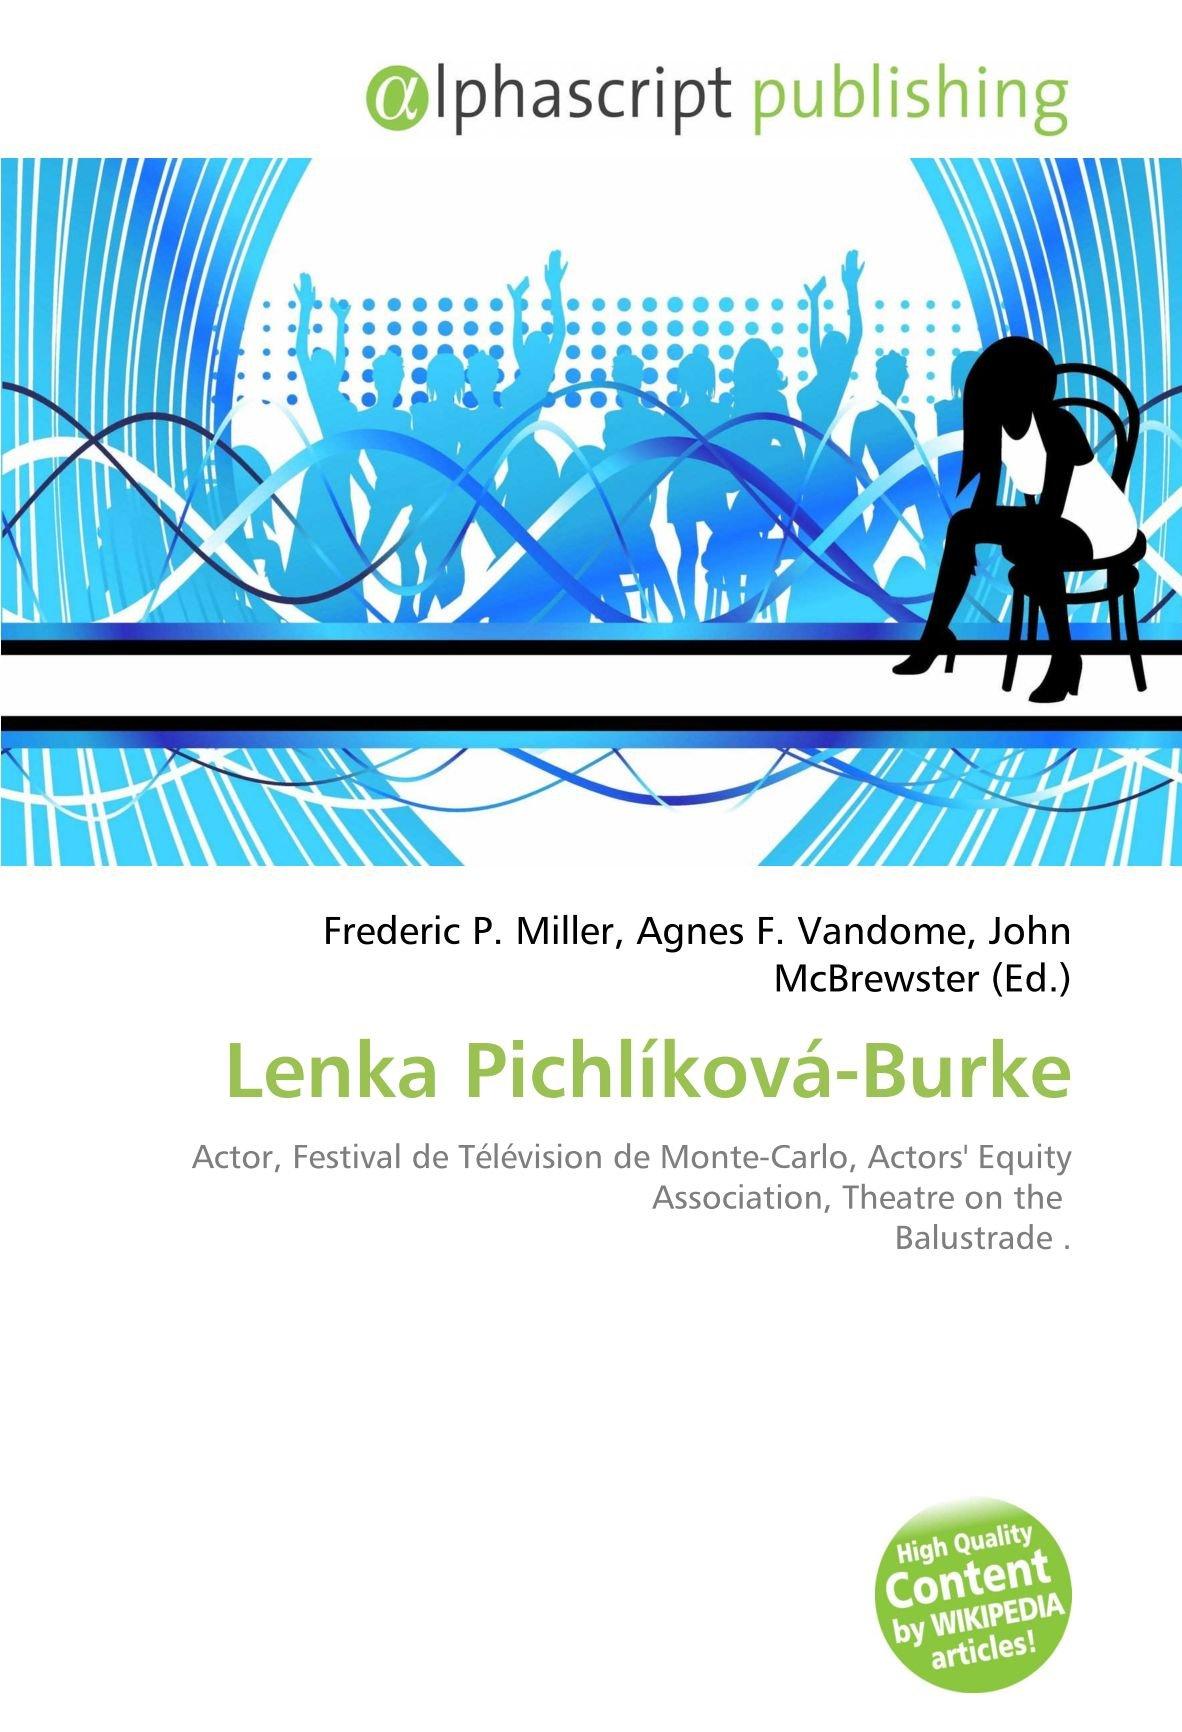 Watch Lenka Pichlikova-Burke video